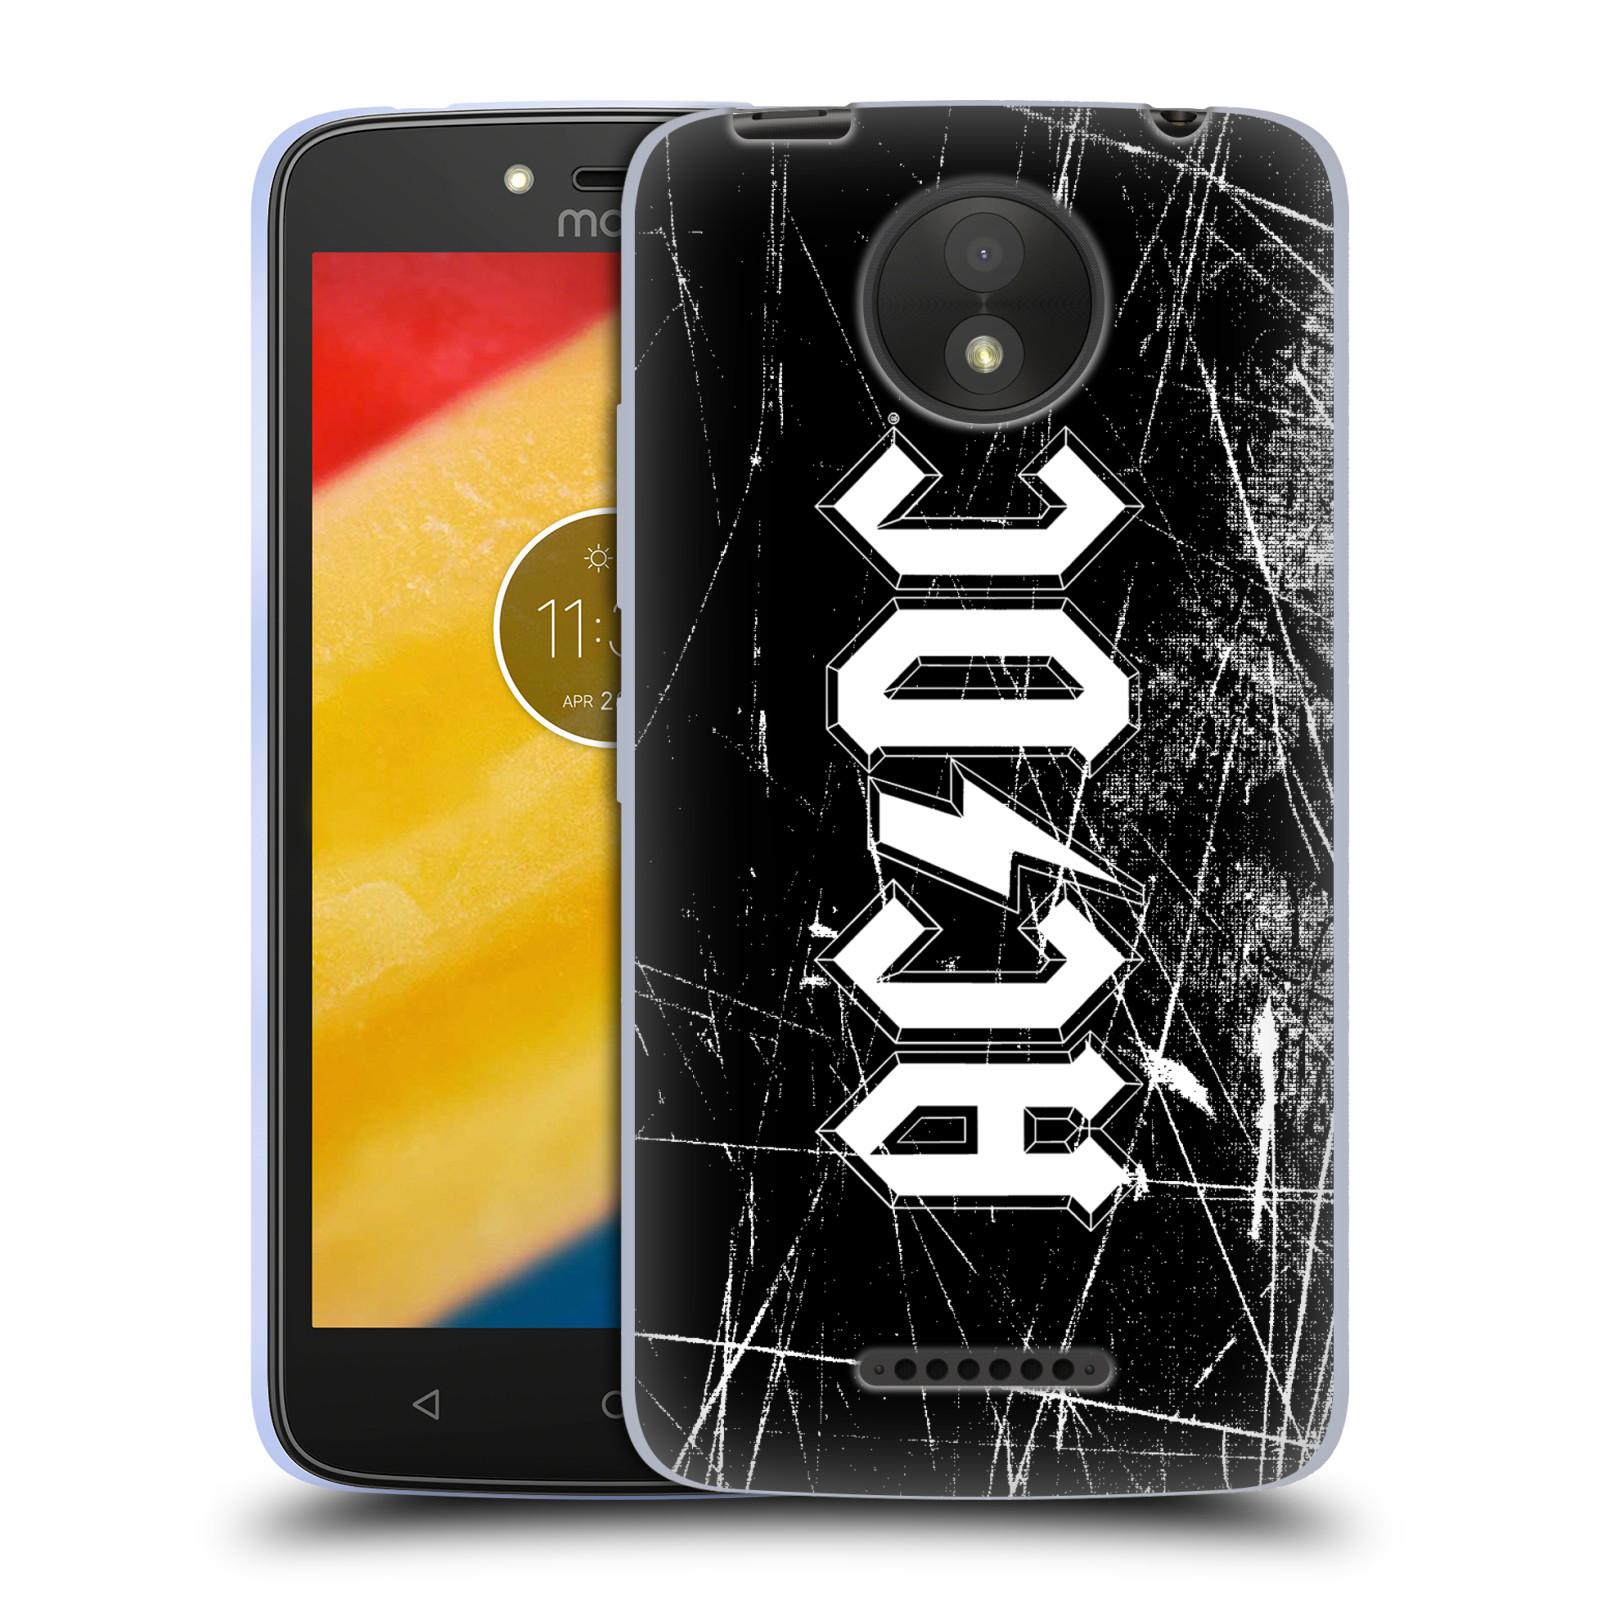 Silikonové pouzdro na mobil Lenovo Moto C Plus - Head Case - AC/DC Černobílé logo